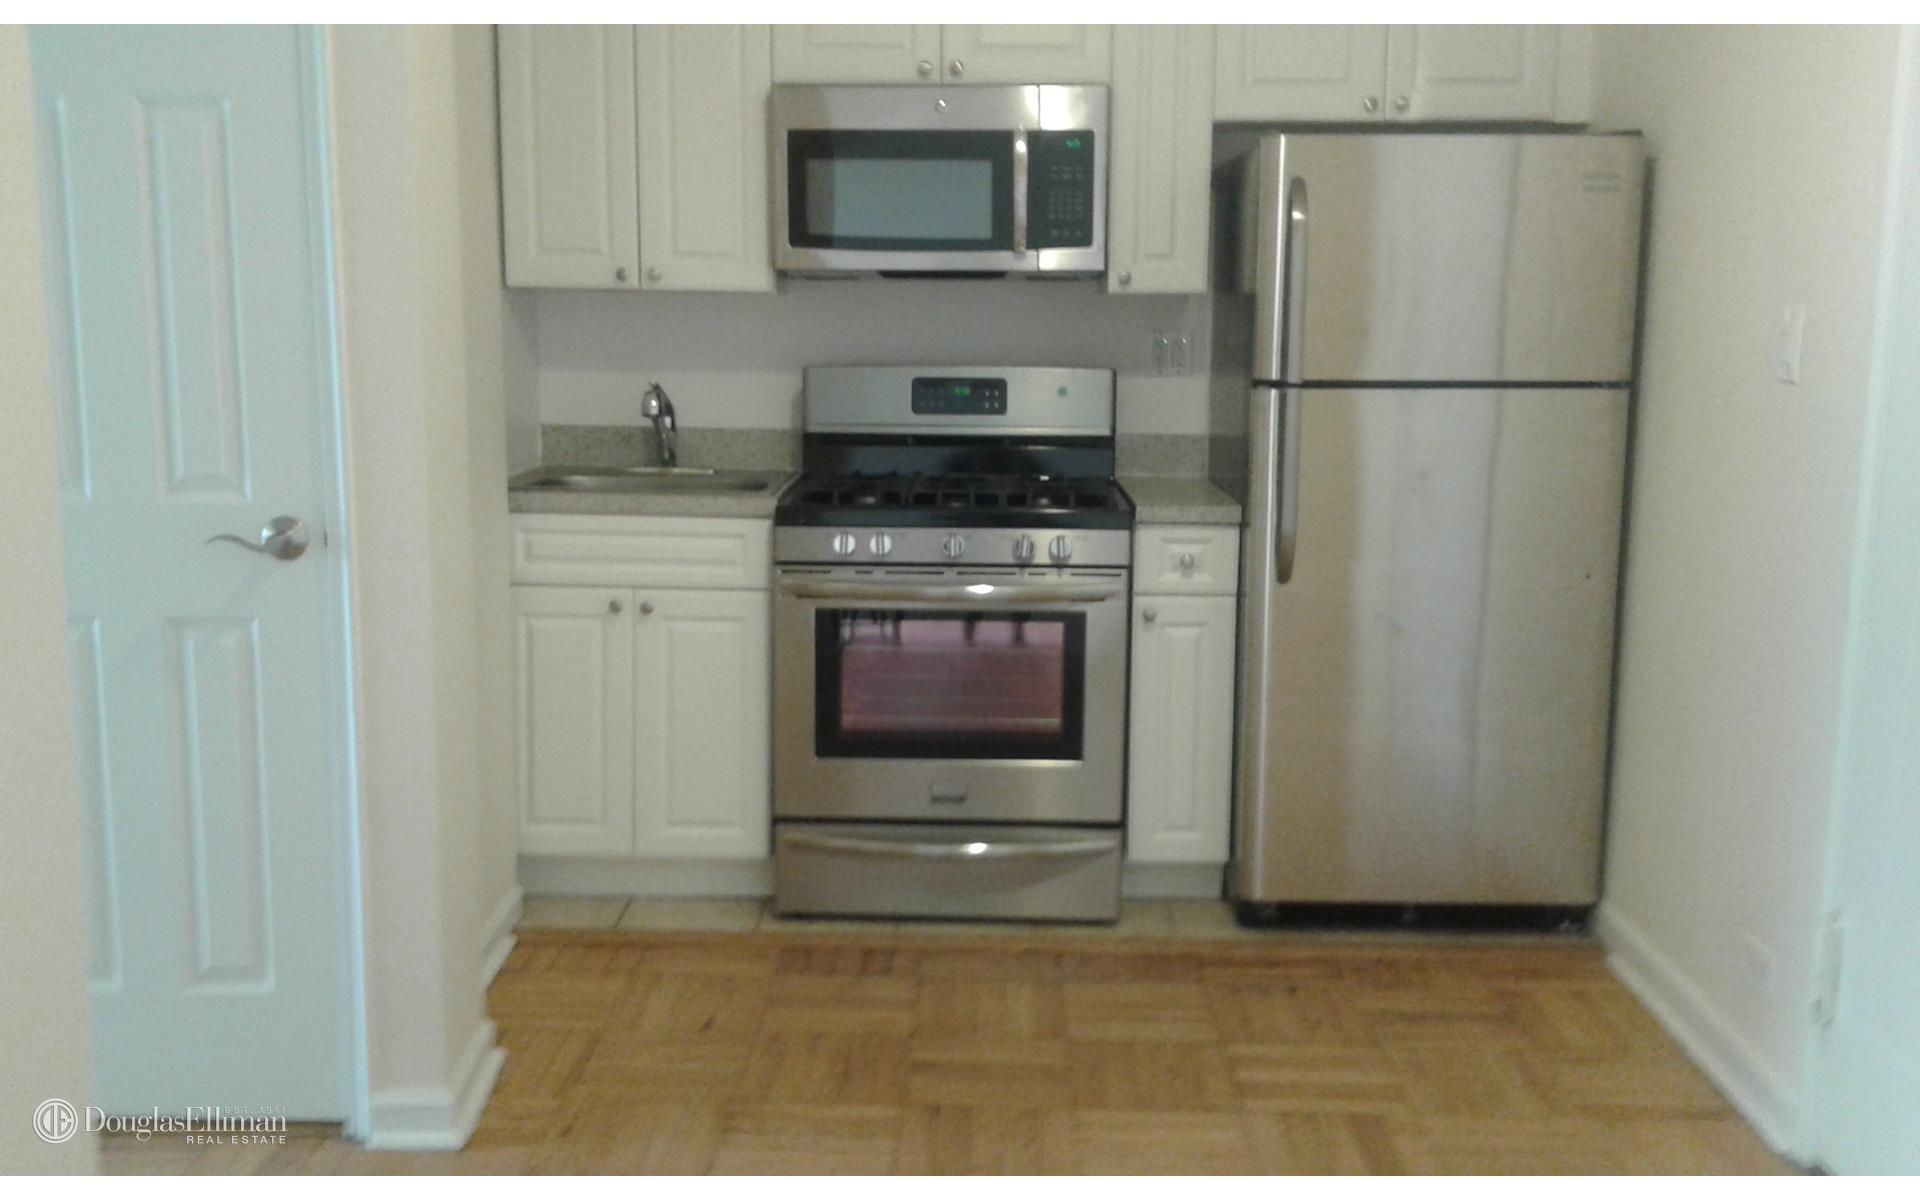 Bronx 1 Bedroom Rental At 930 Grand Concourse Bronx Ny